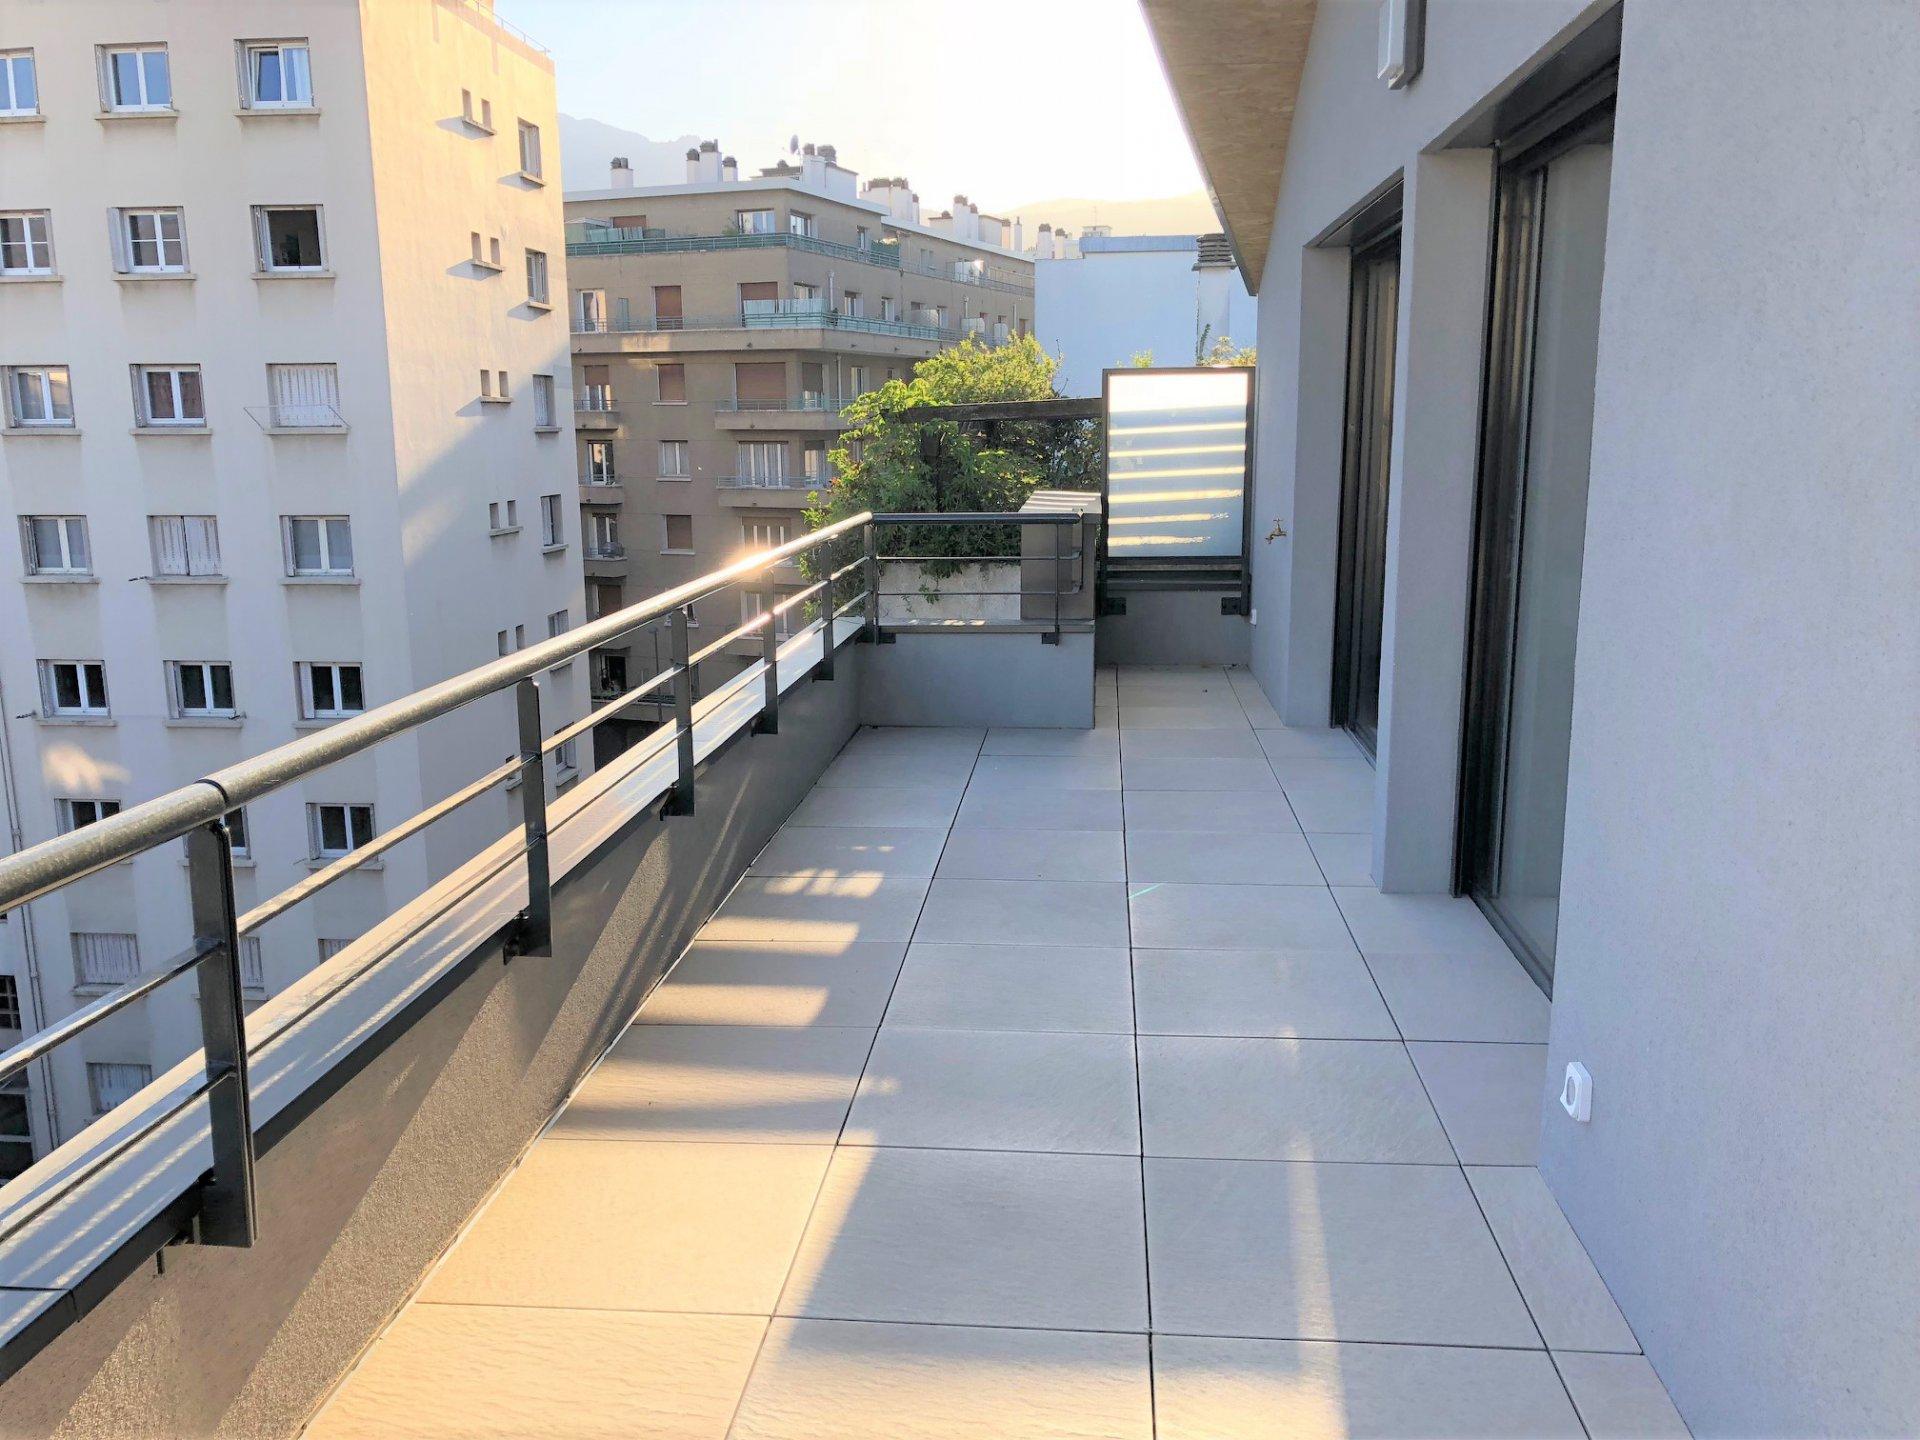 Terrasse au sud